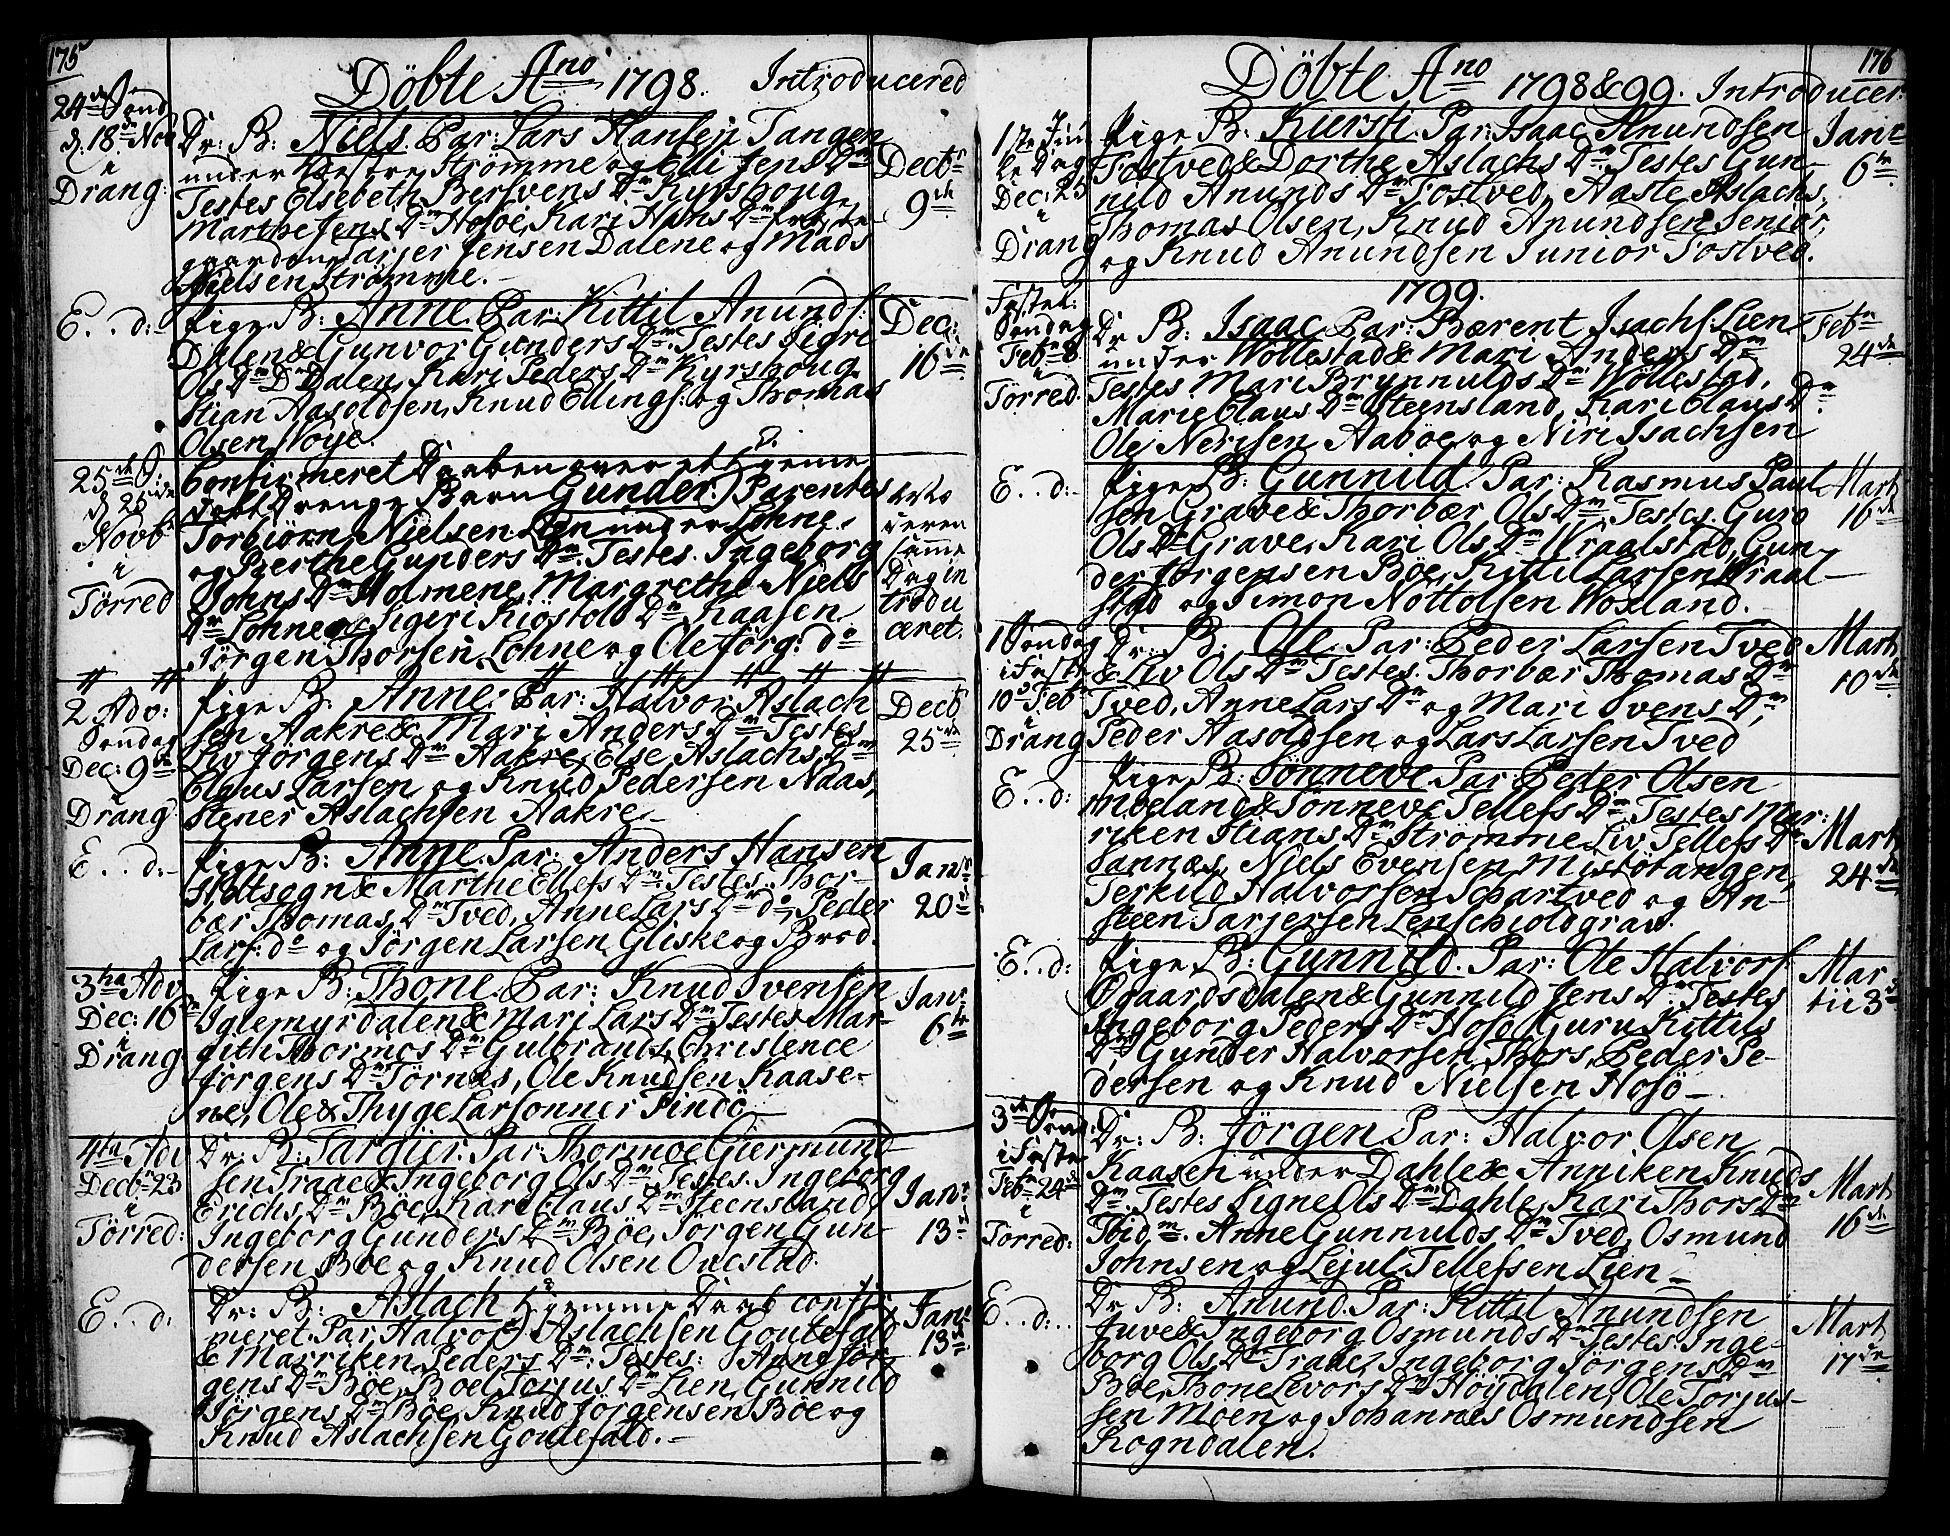 SAKO, Drangedal kirkebøker, F/Fa/L0003: Ministerialbok nr. 3, 1768-1814, s. 175-176